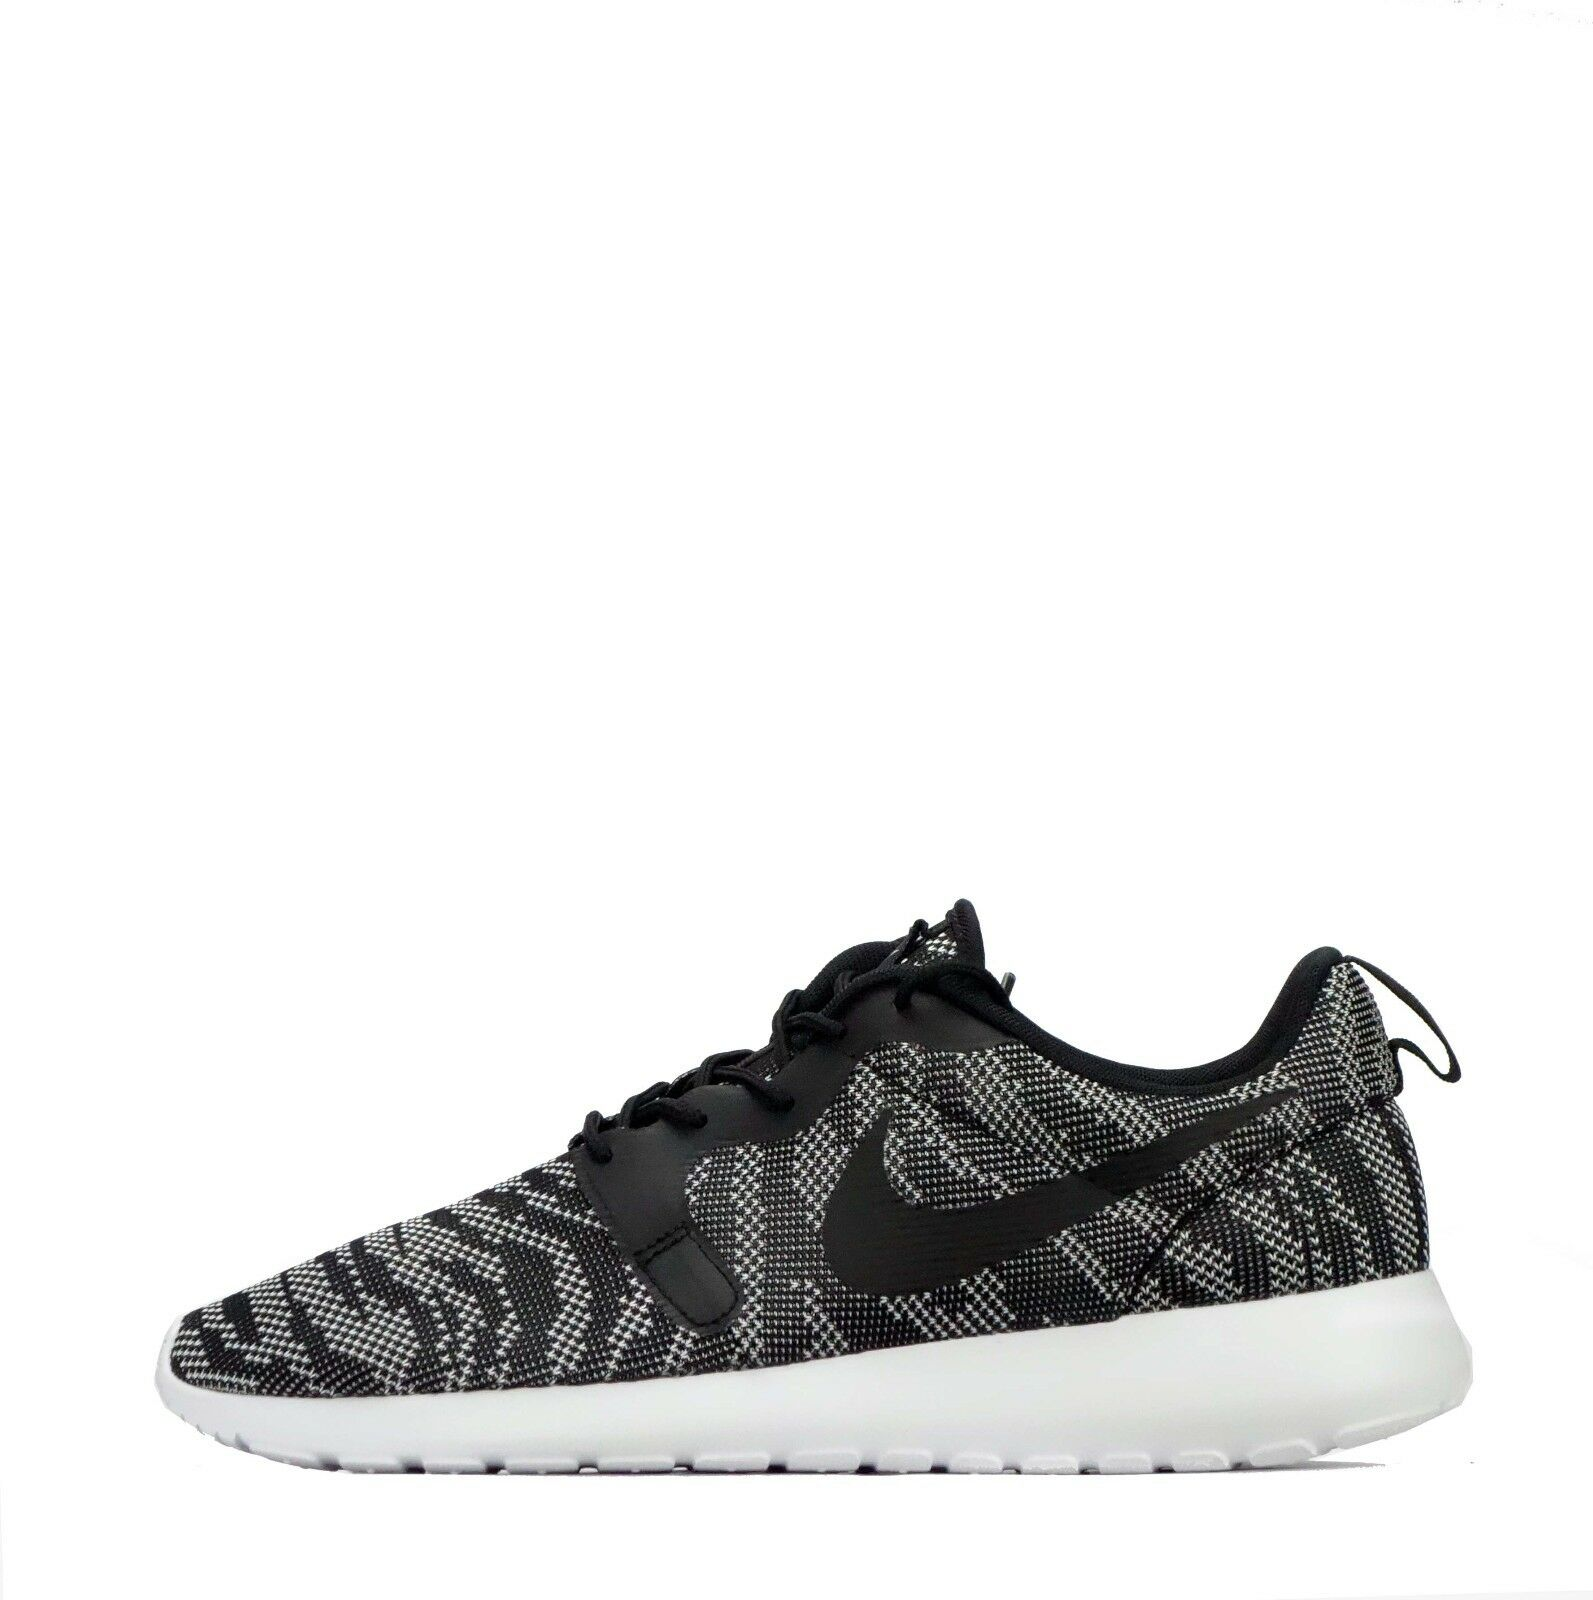 Nike Roshe Run Jacquard Women's shoes White Black